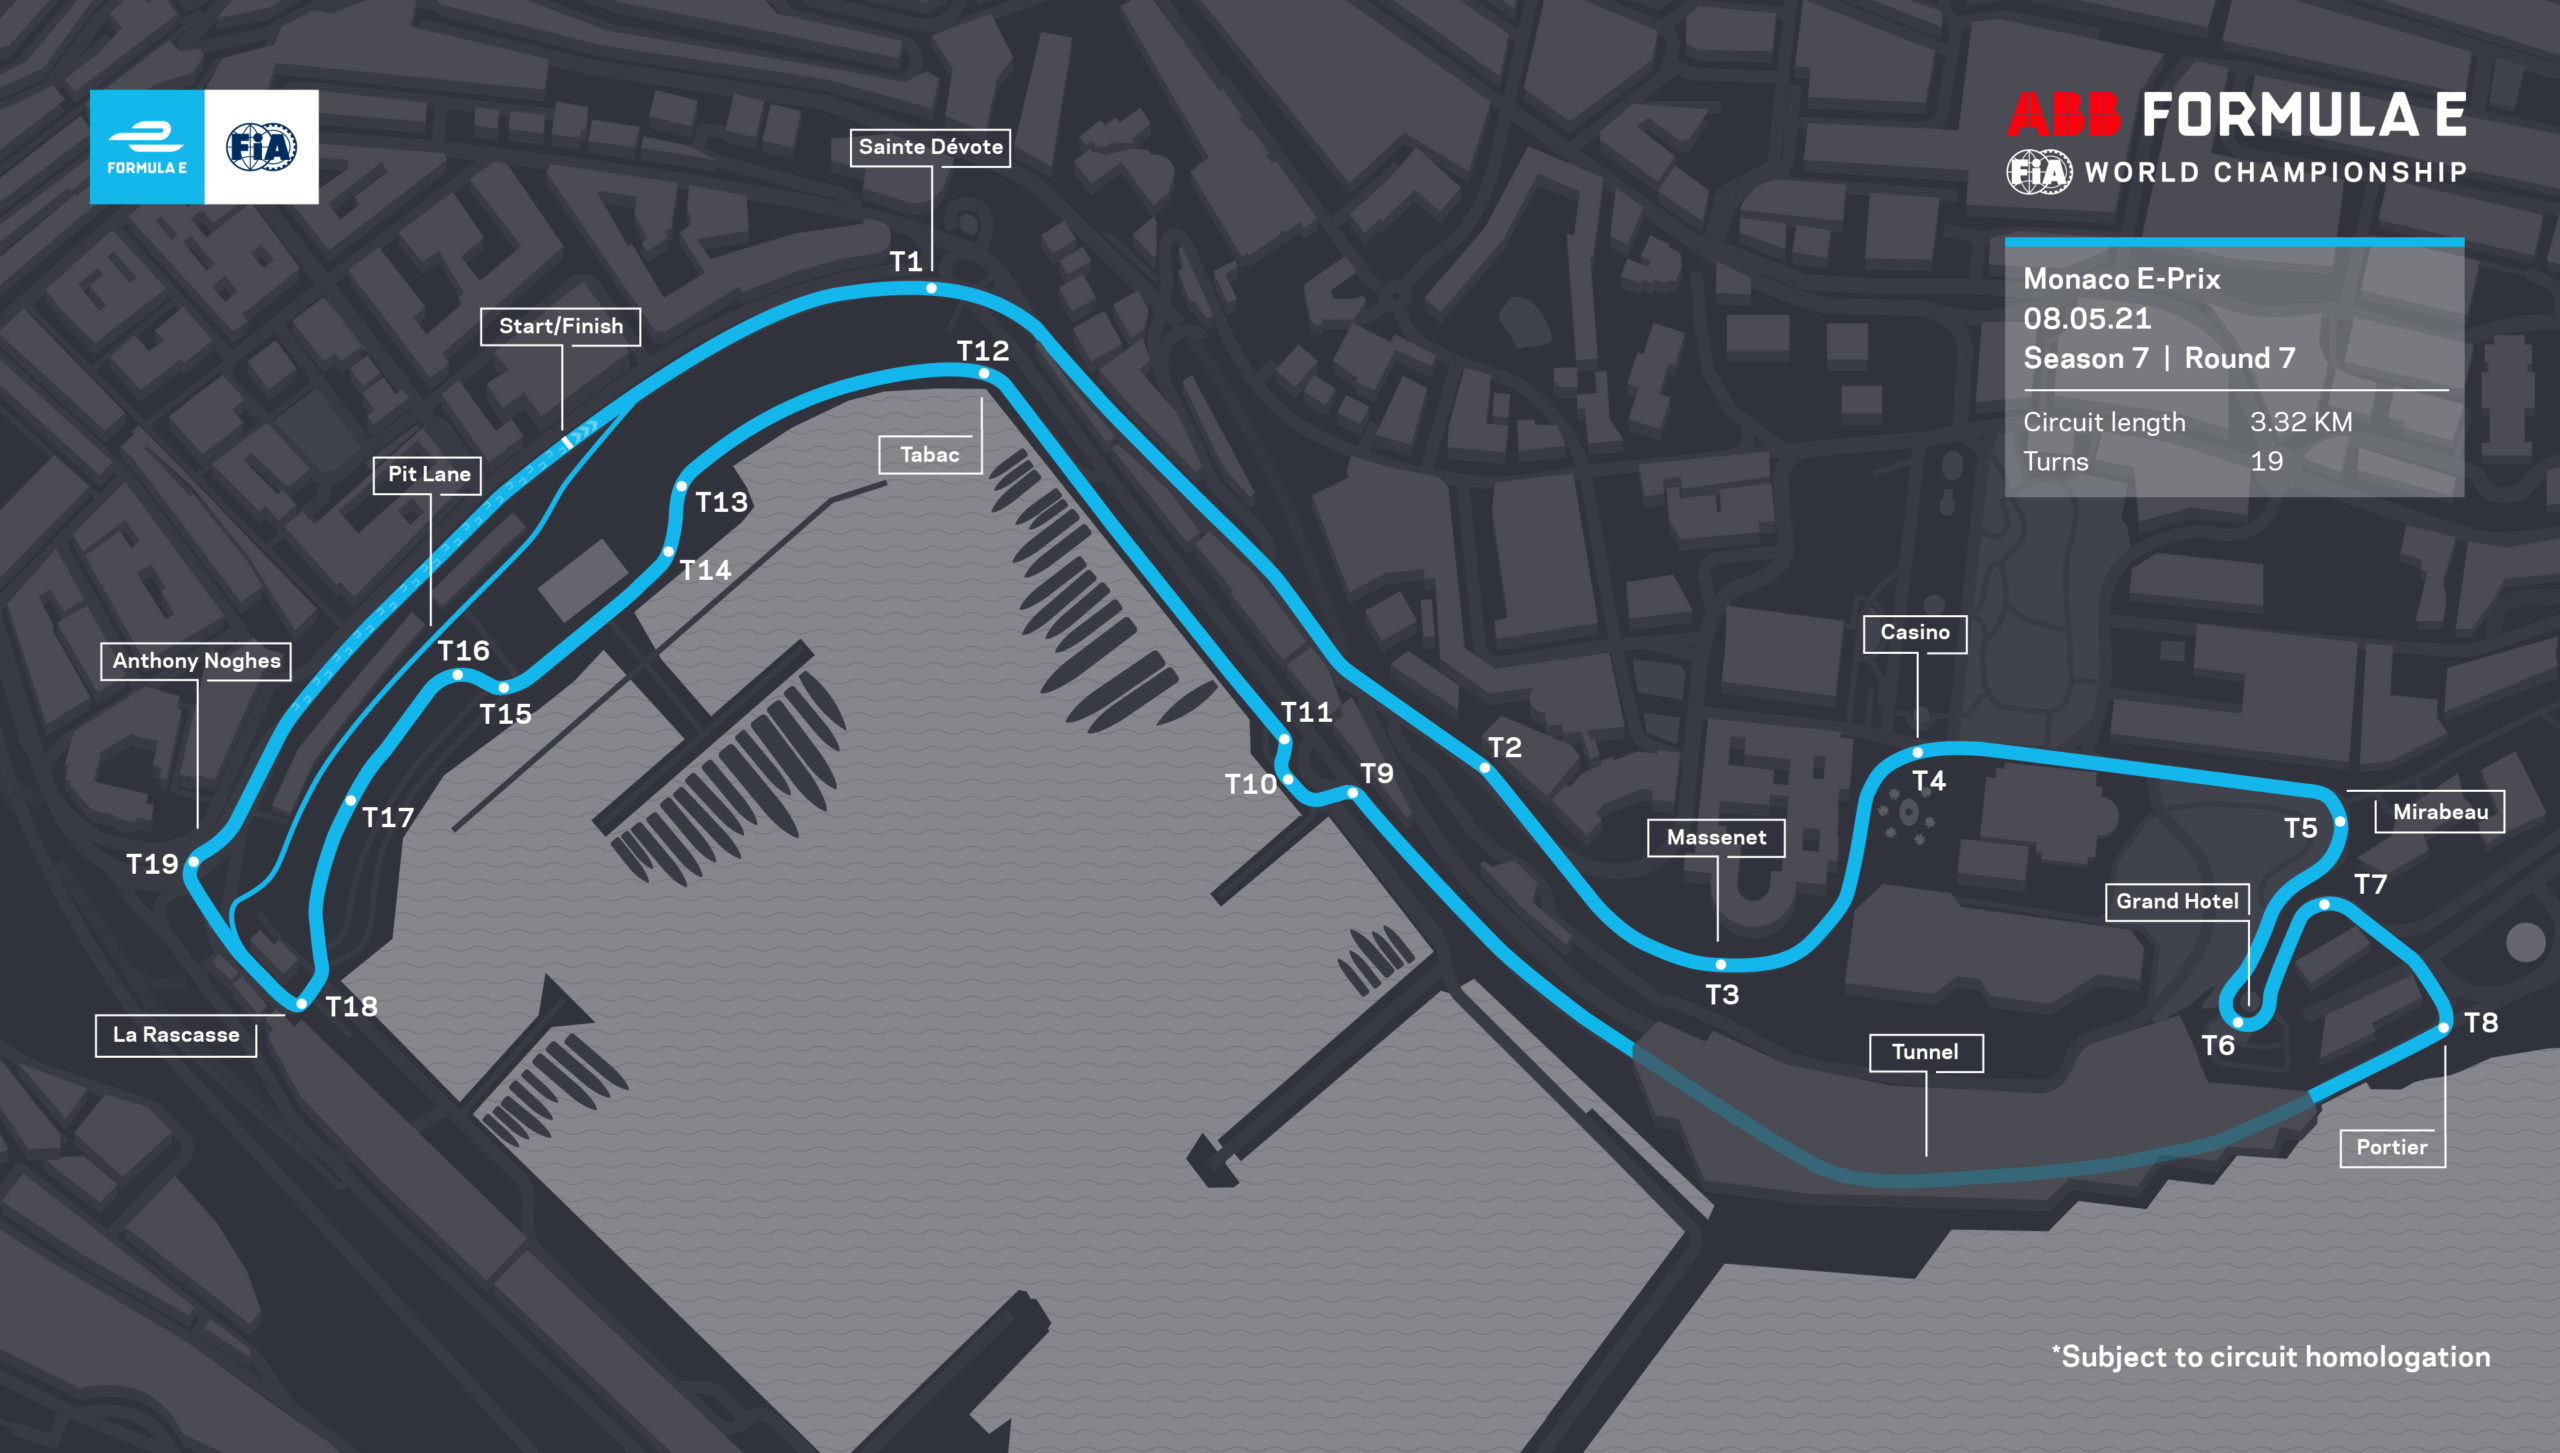 ePrix Monaco trazado 2021, Formula E